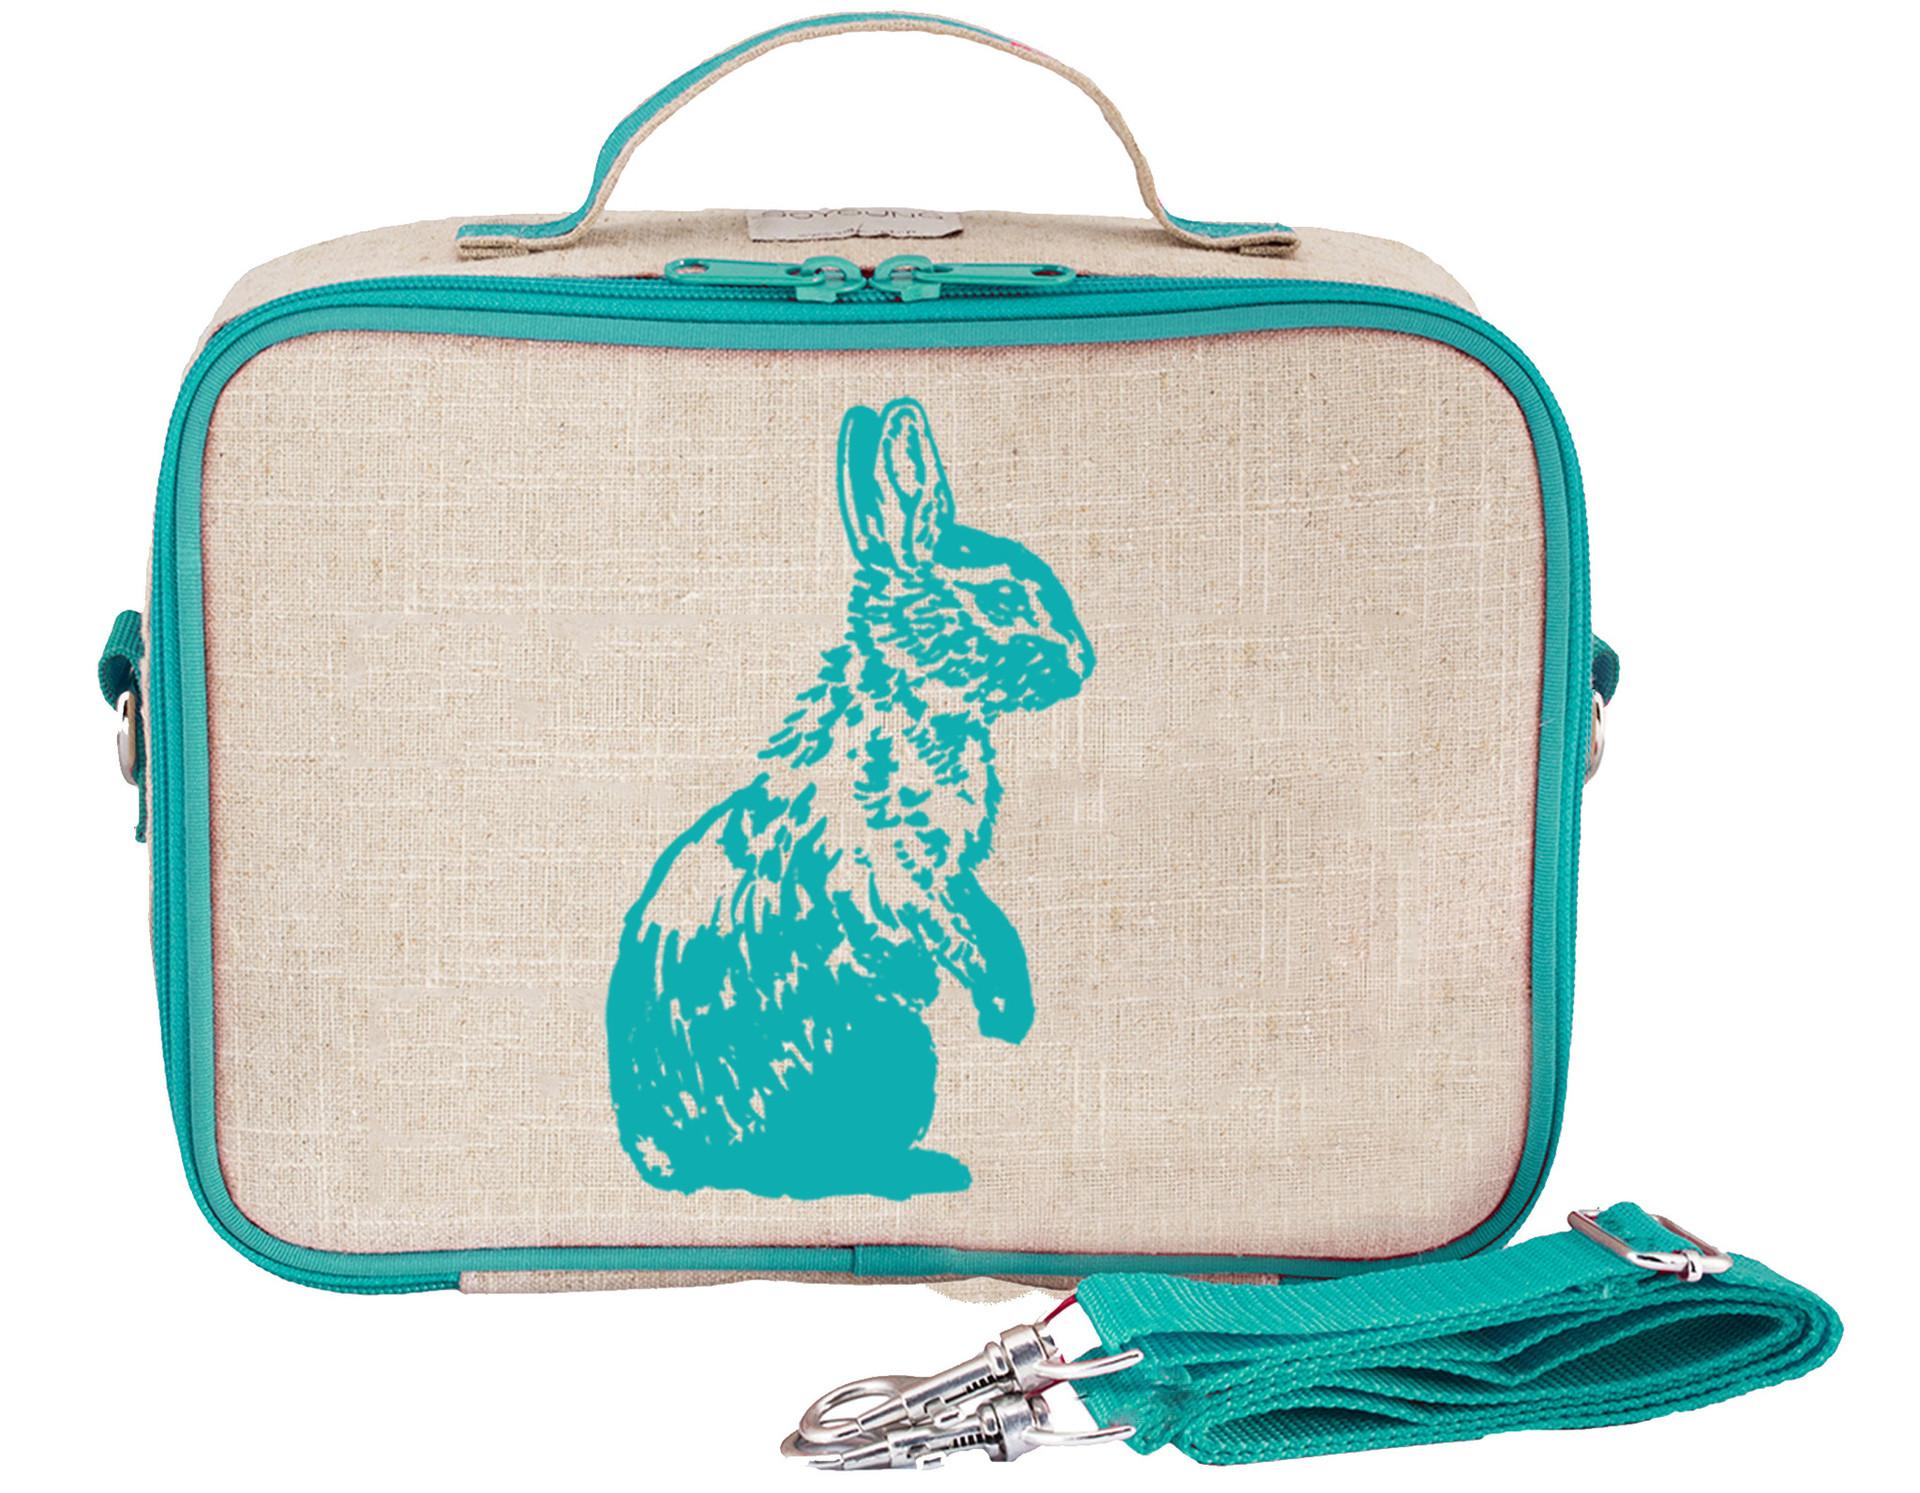 So Young Lunch Bag - Aqua Bunny